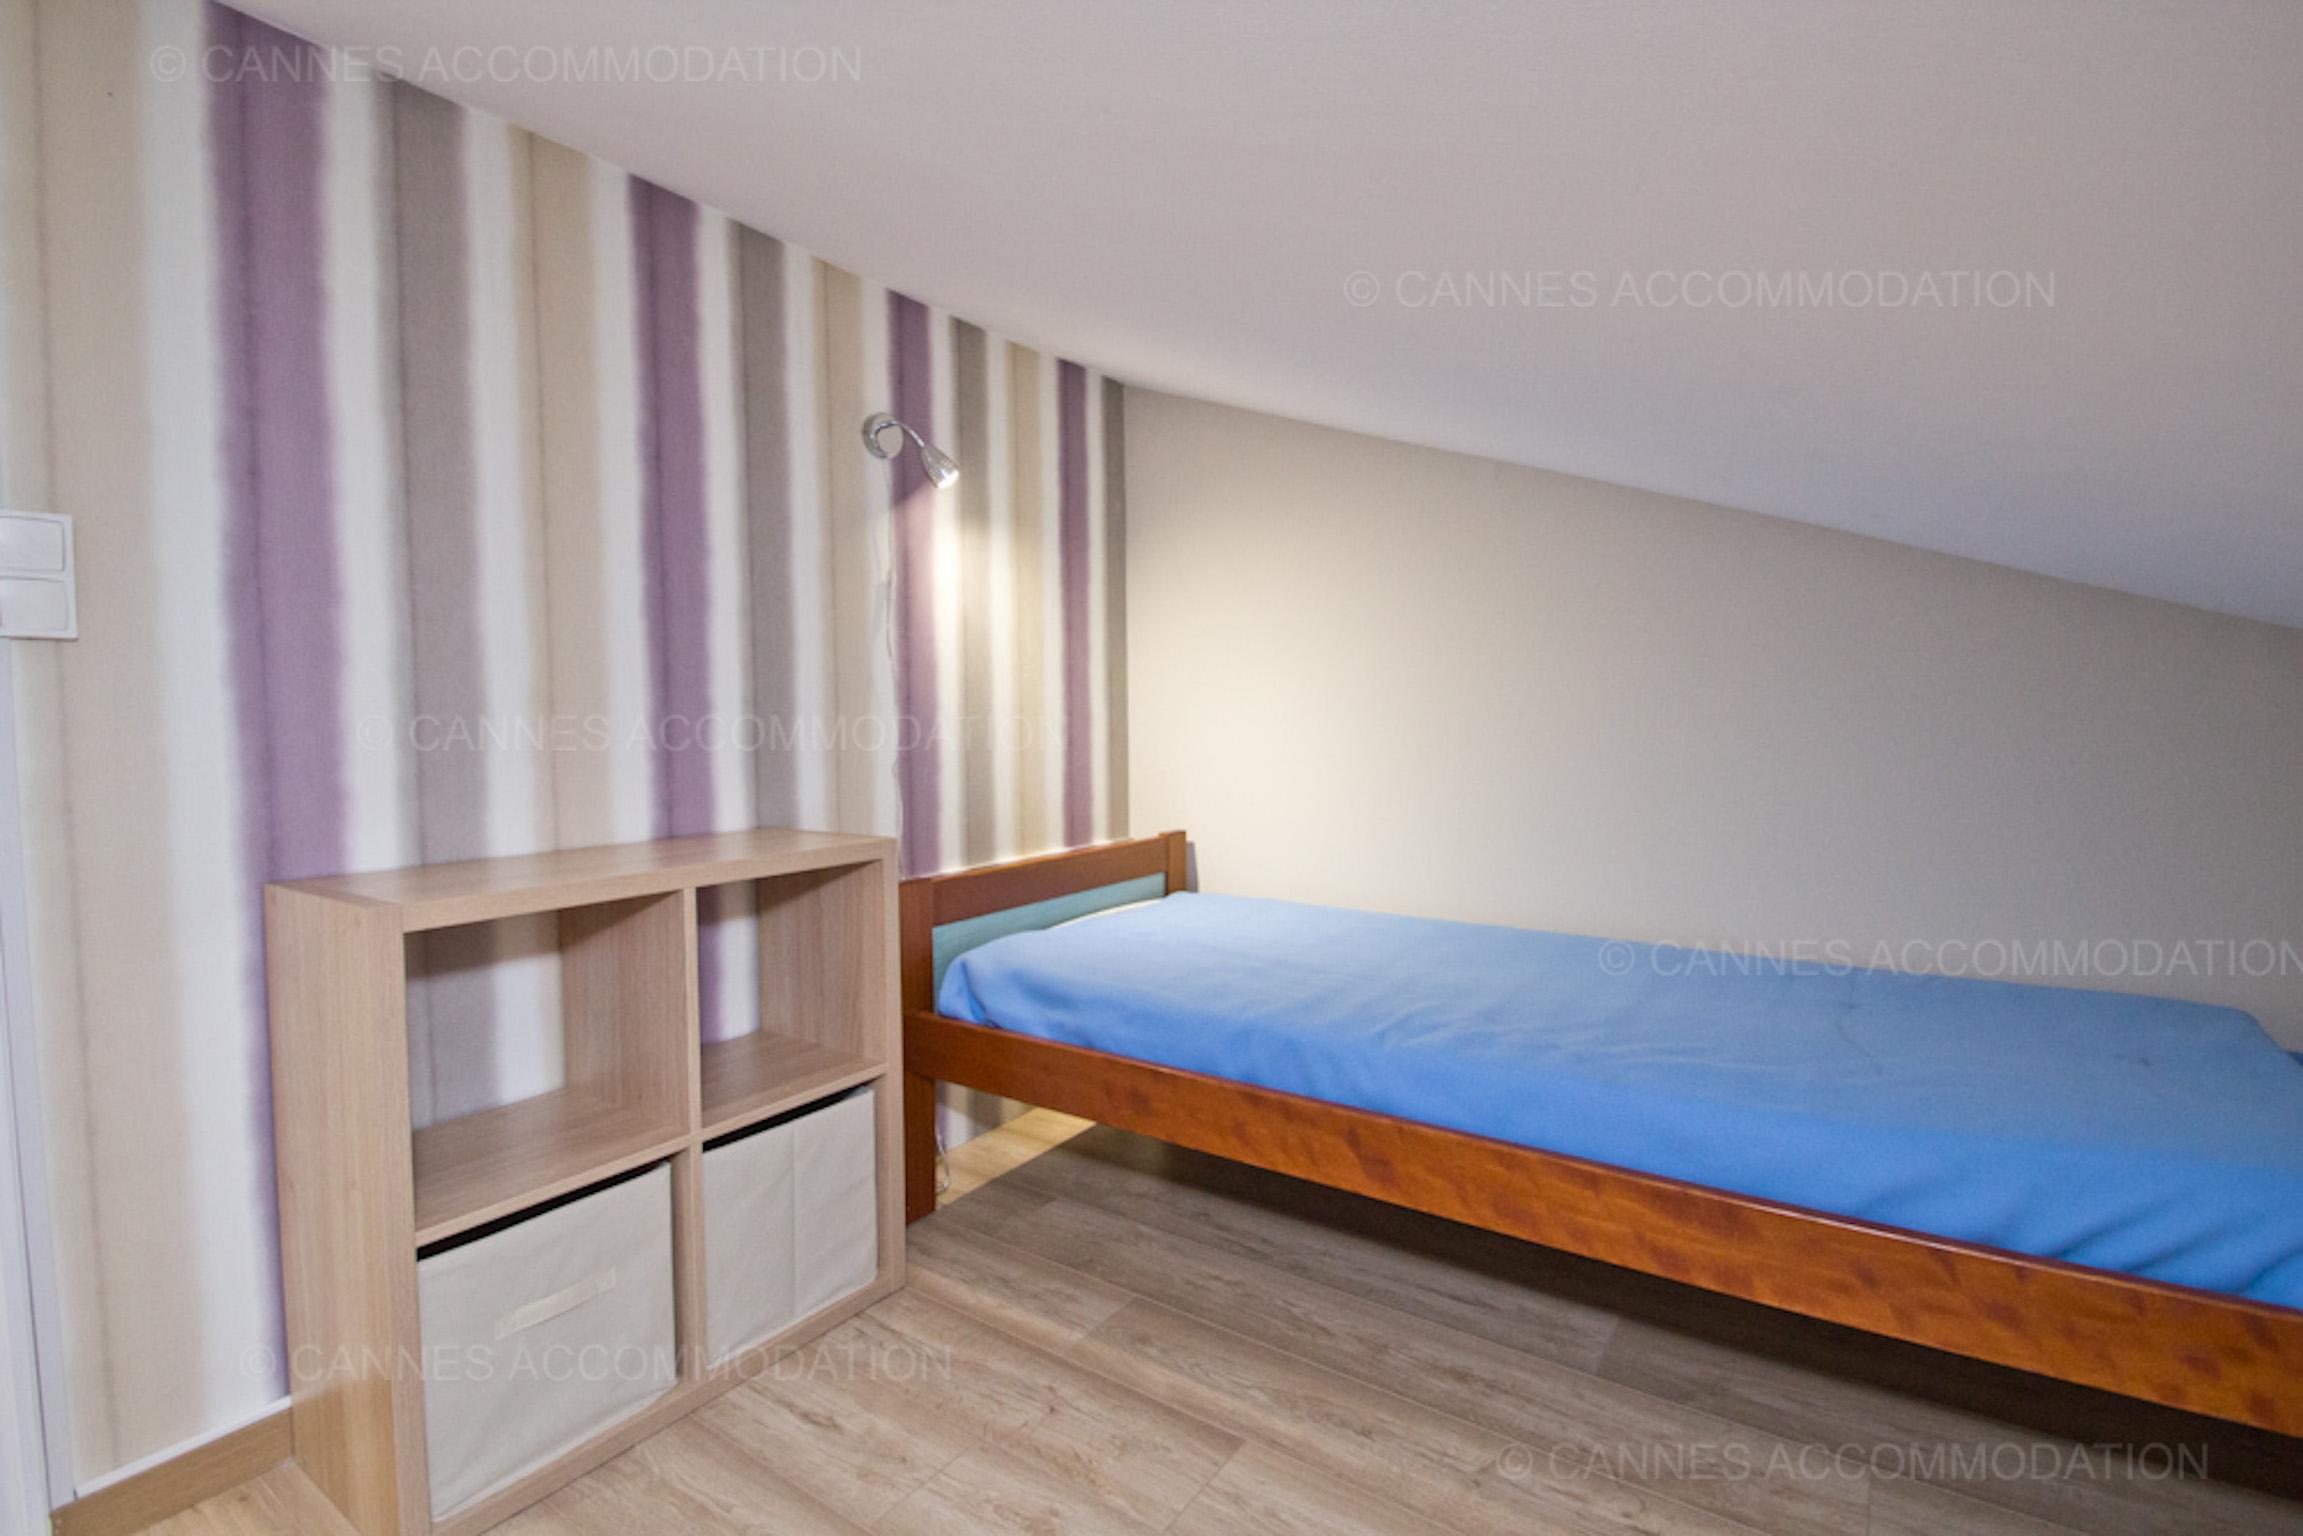 Appartement 2 chambres louer cannes secteur carlton martinez foug re cannes accommodation - Prix chambre carlton cannes ...